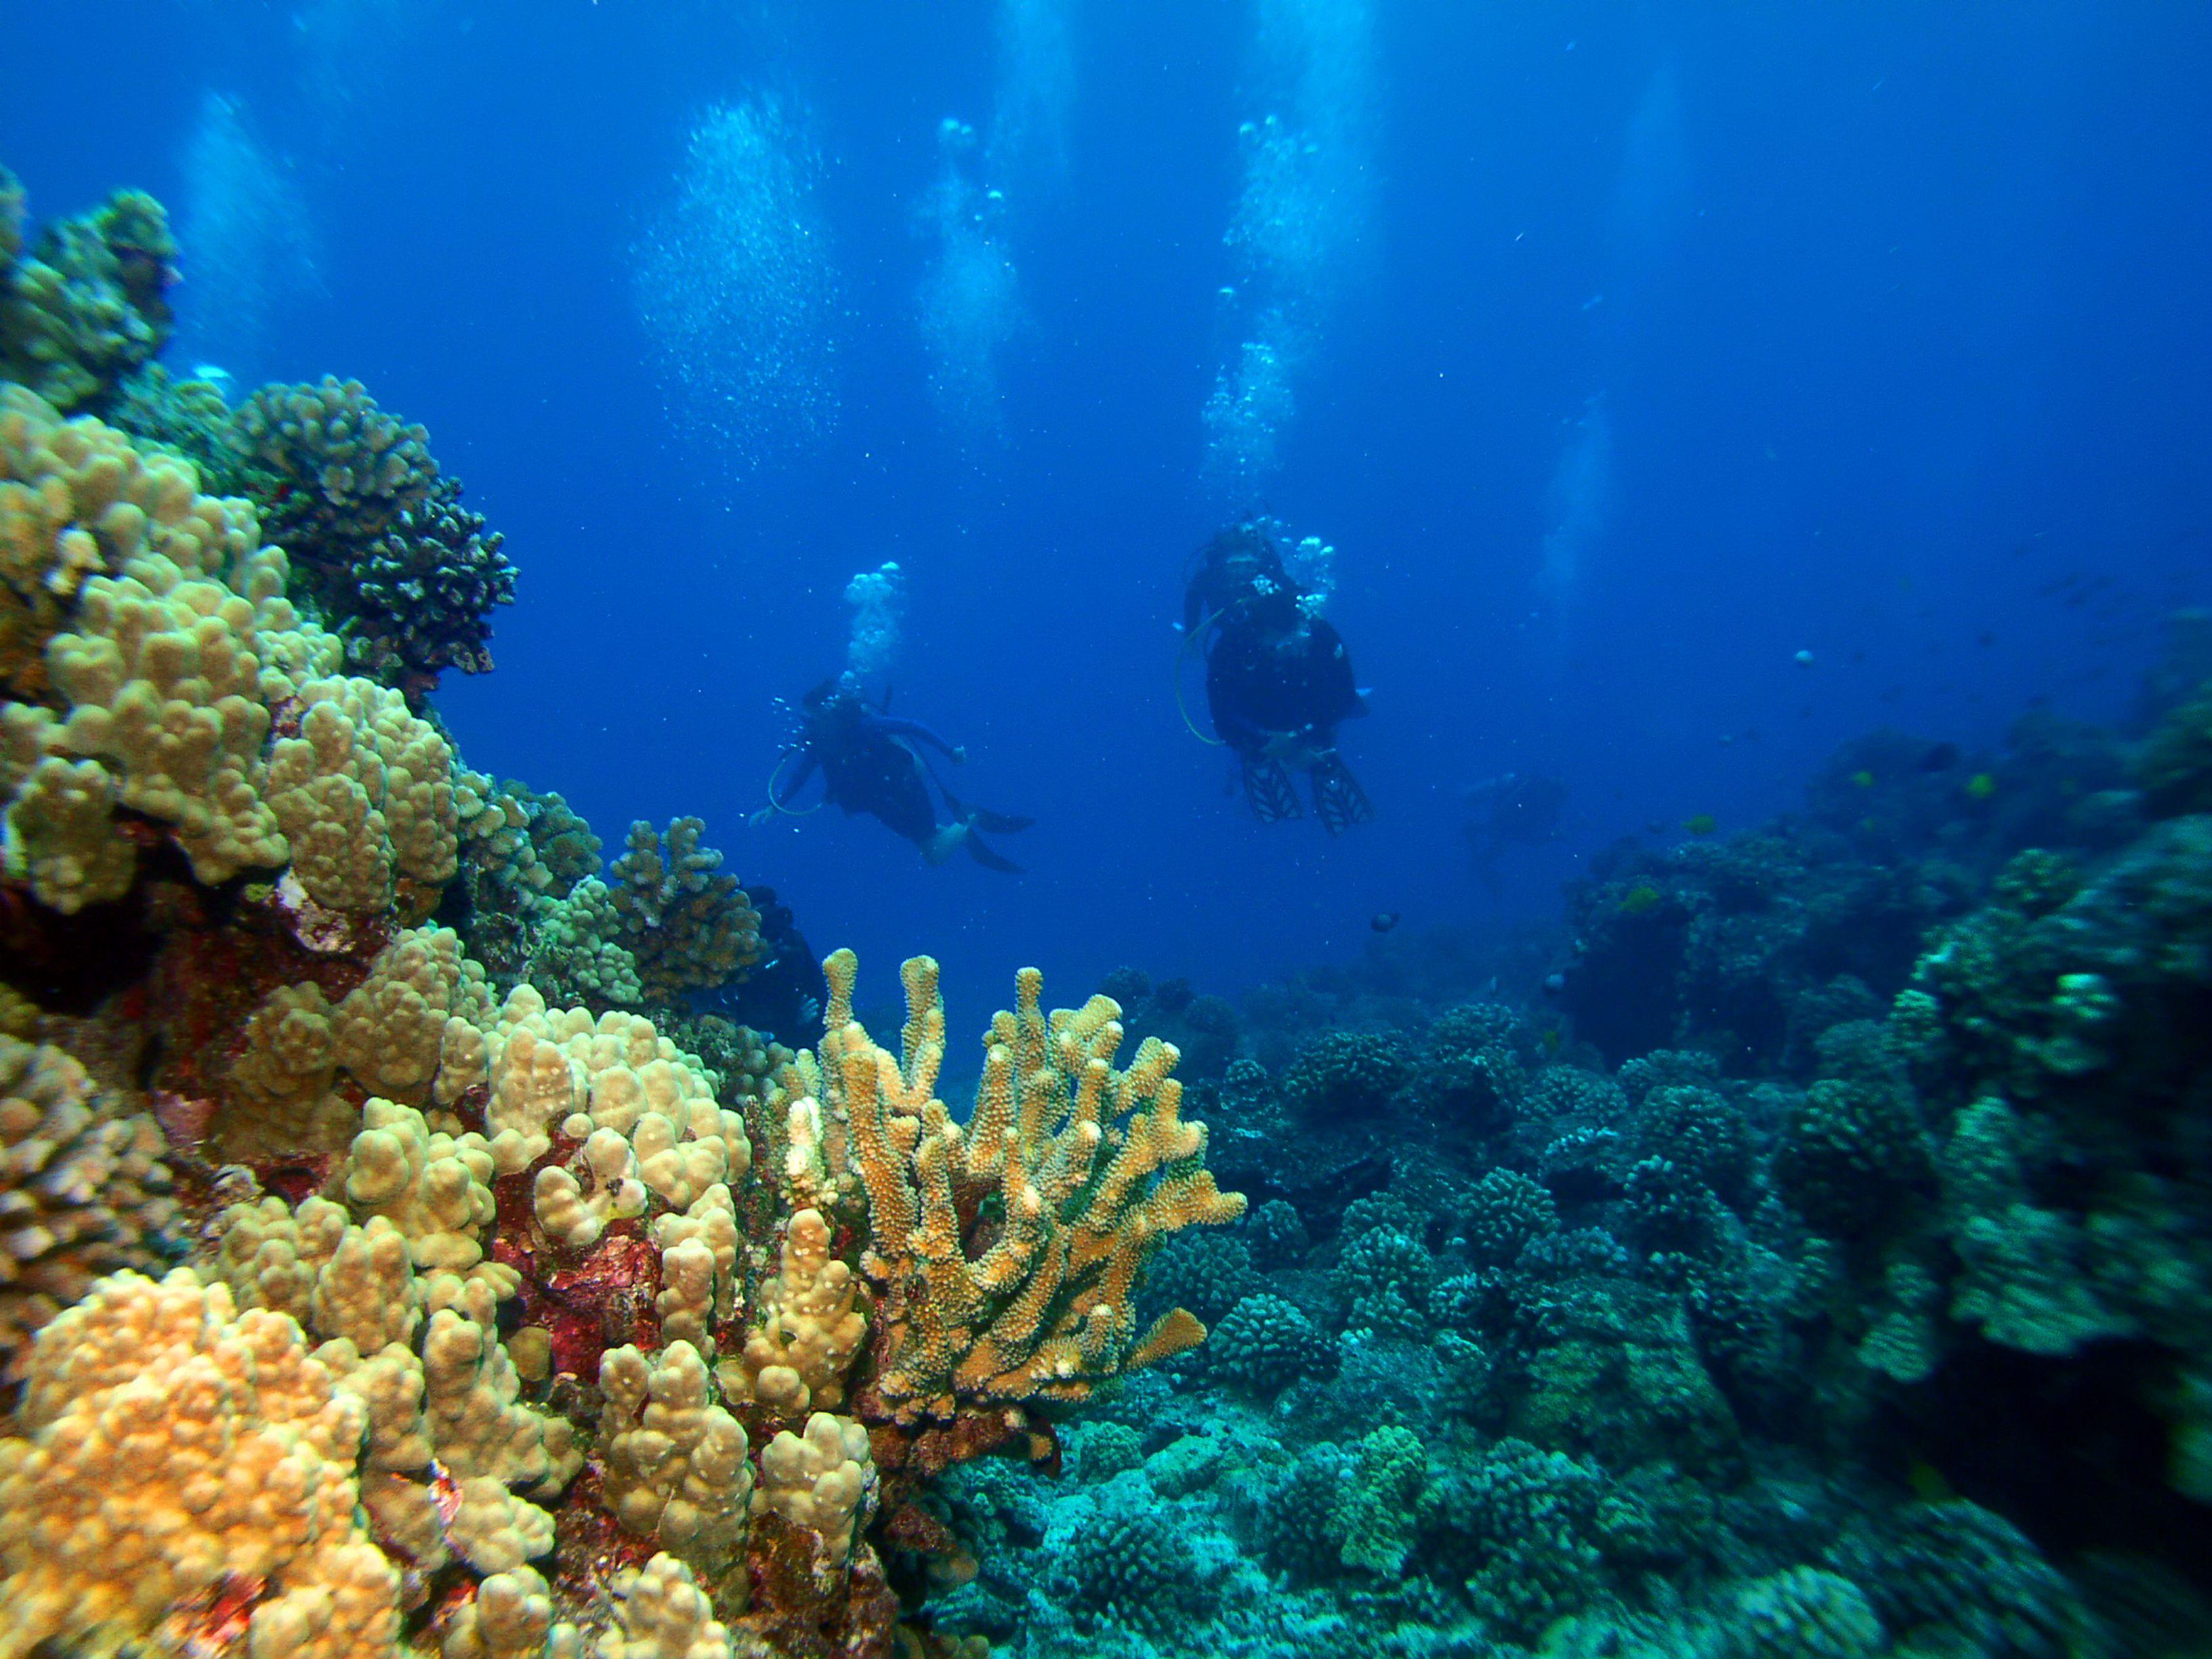 Scuba divers swimming through coral reefs around Big Island